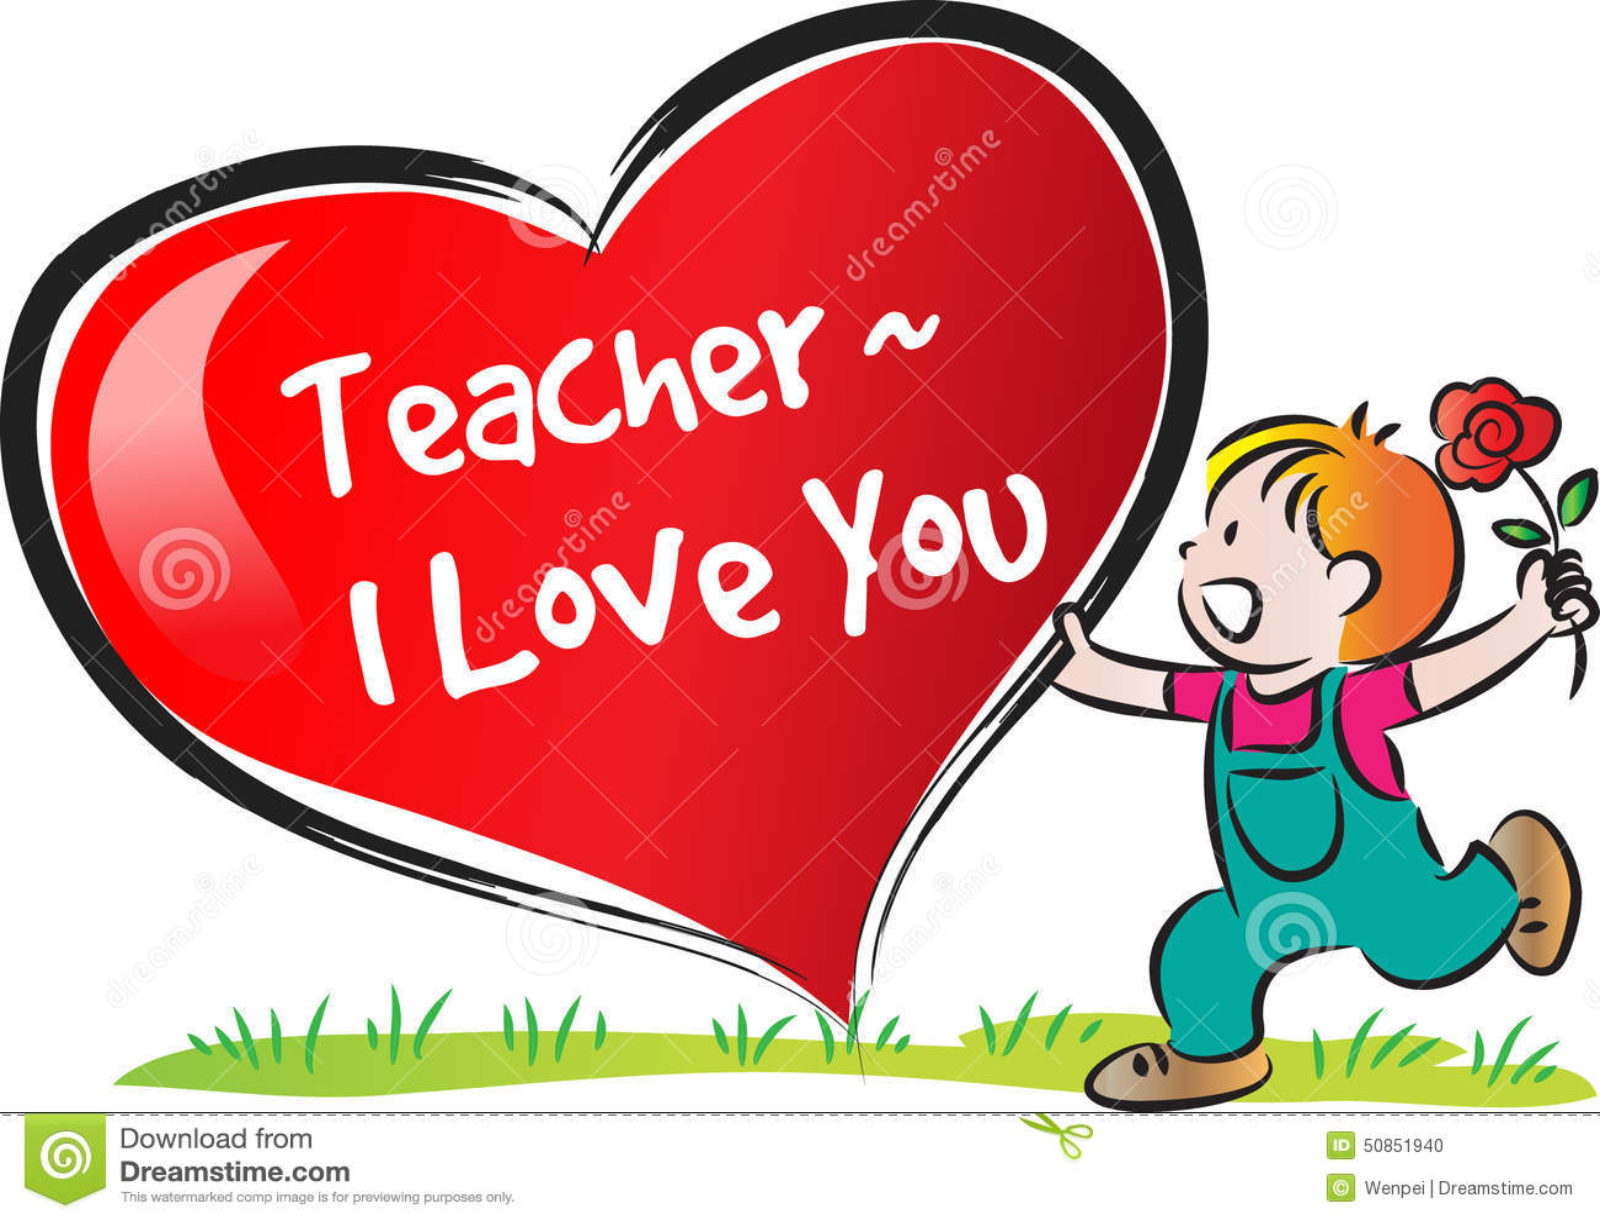 clipart for teachers day - photo #16